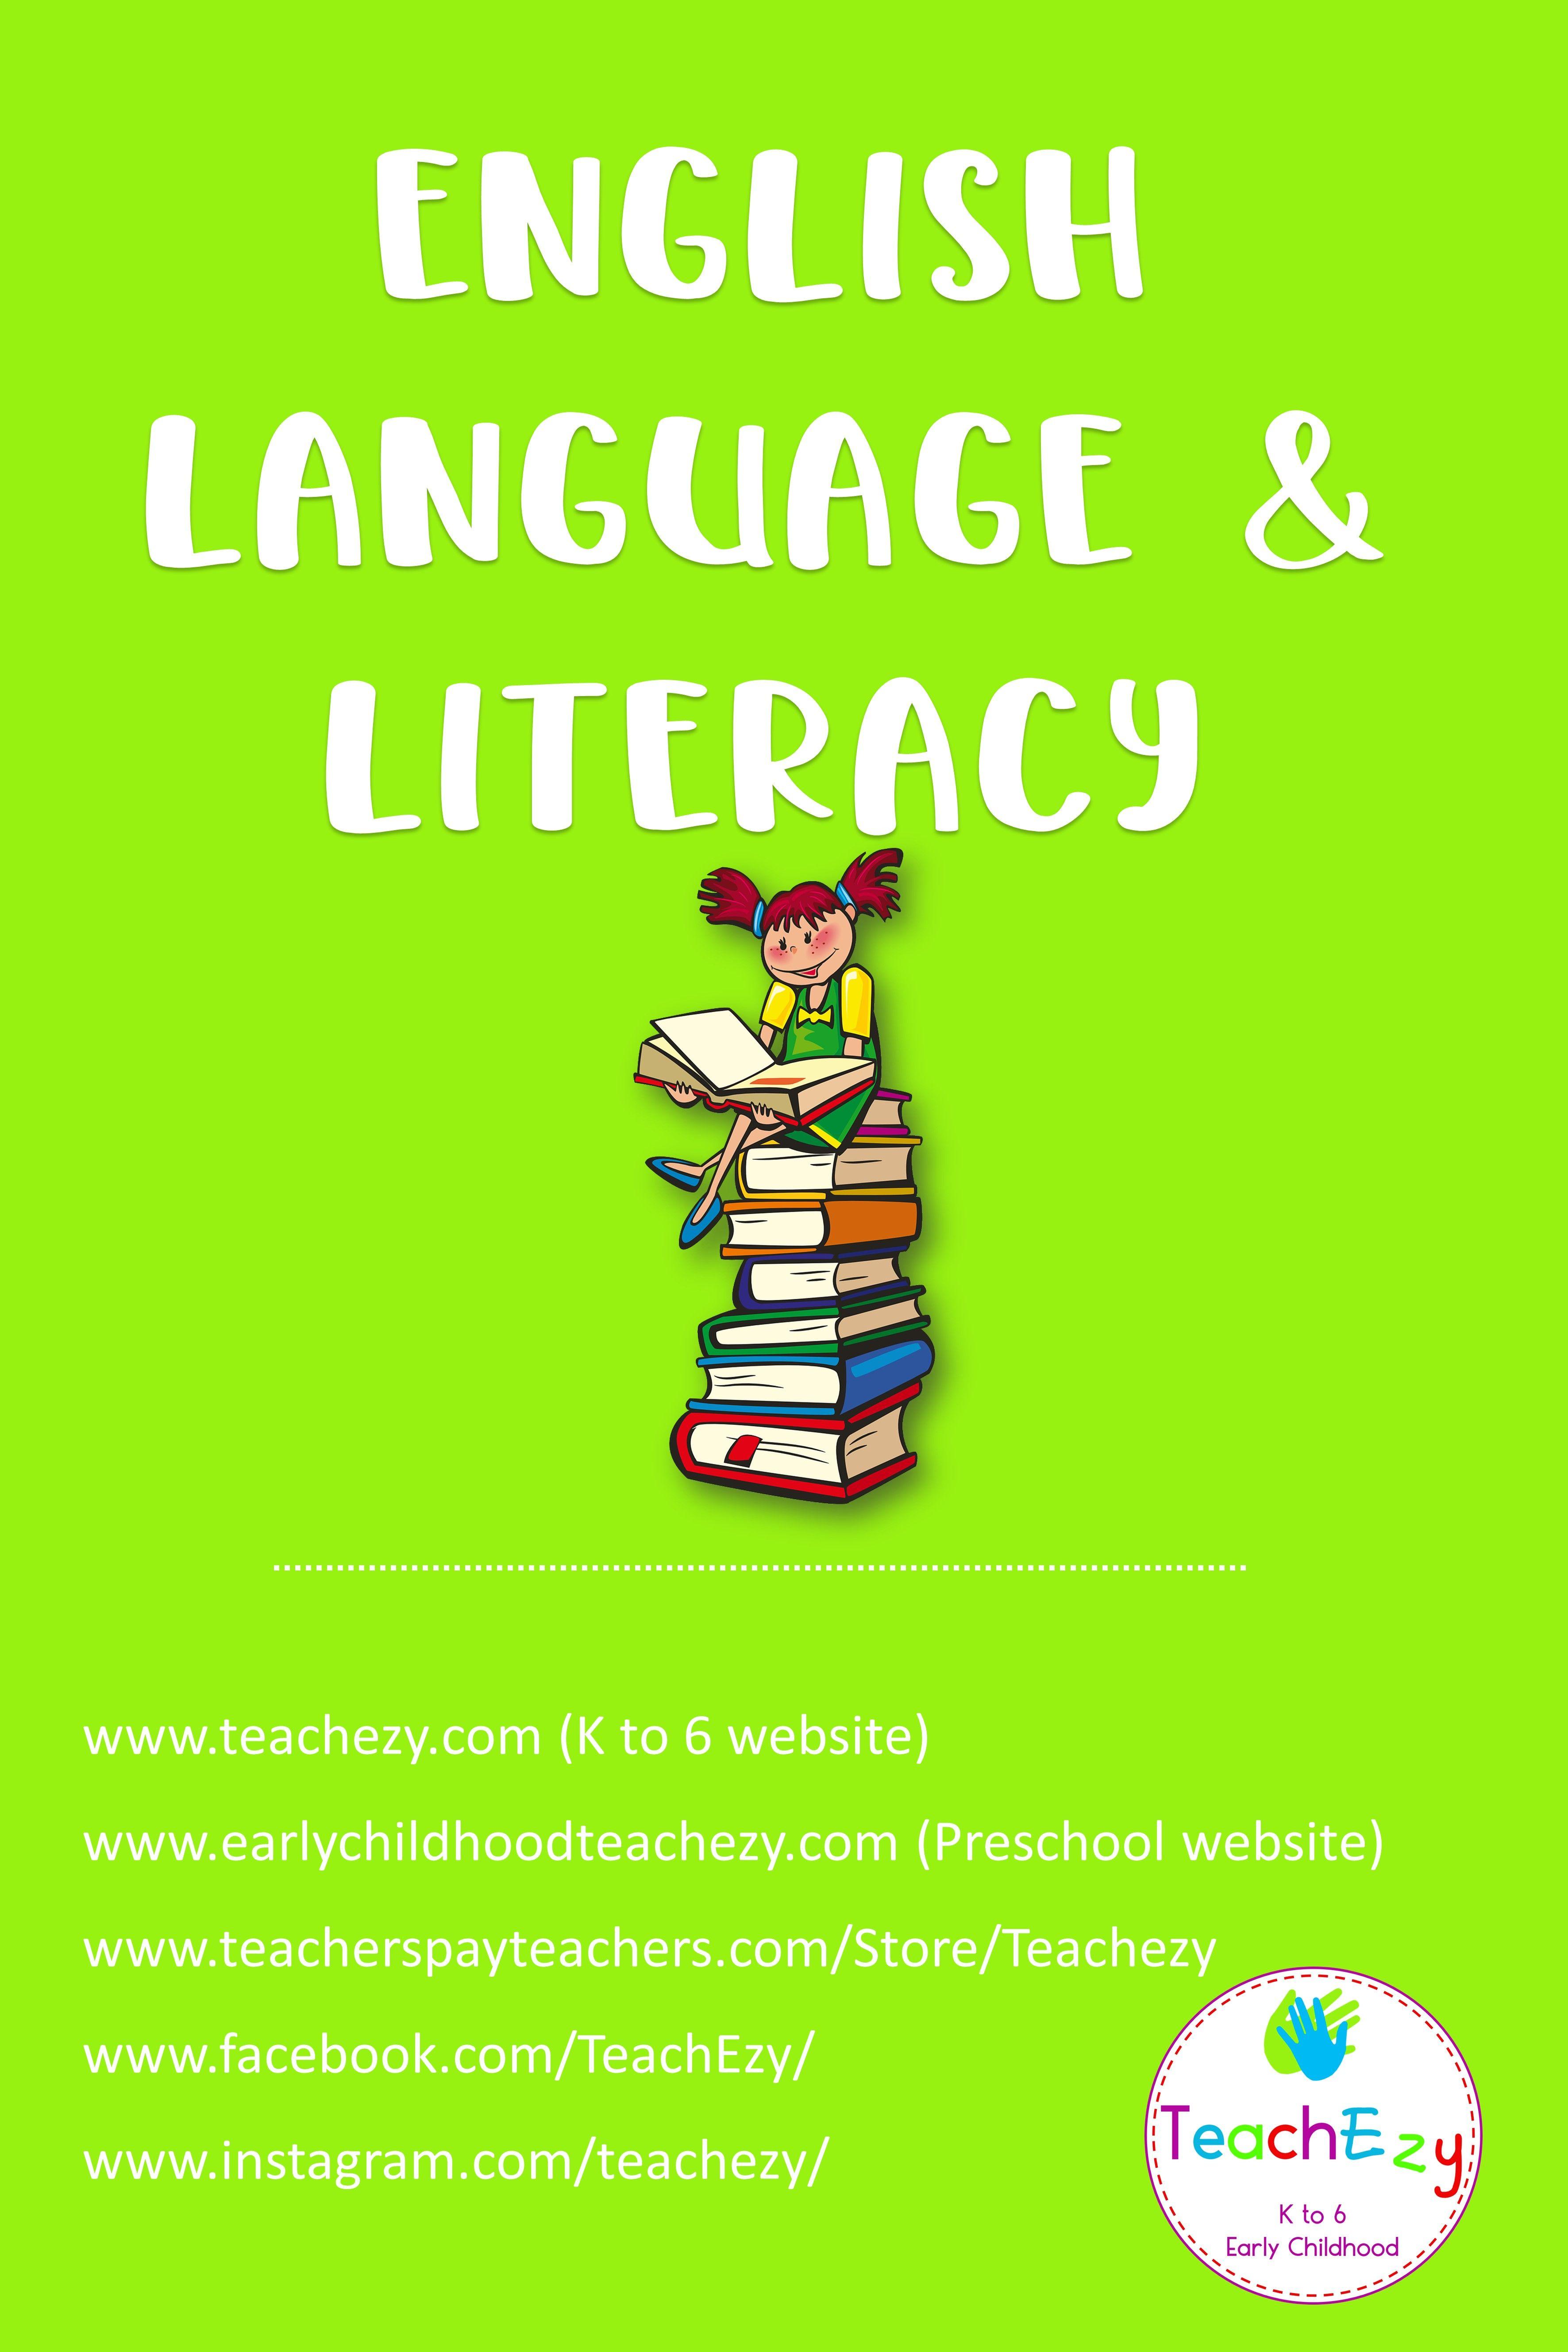 English Language And Literacy Teacher Resources Literacy And Numeracy Teaching Resources Teaching [ 5315 x 3543 Pixel ]